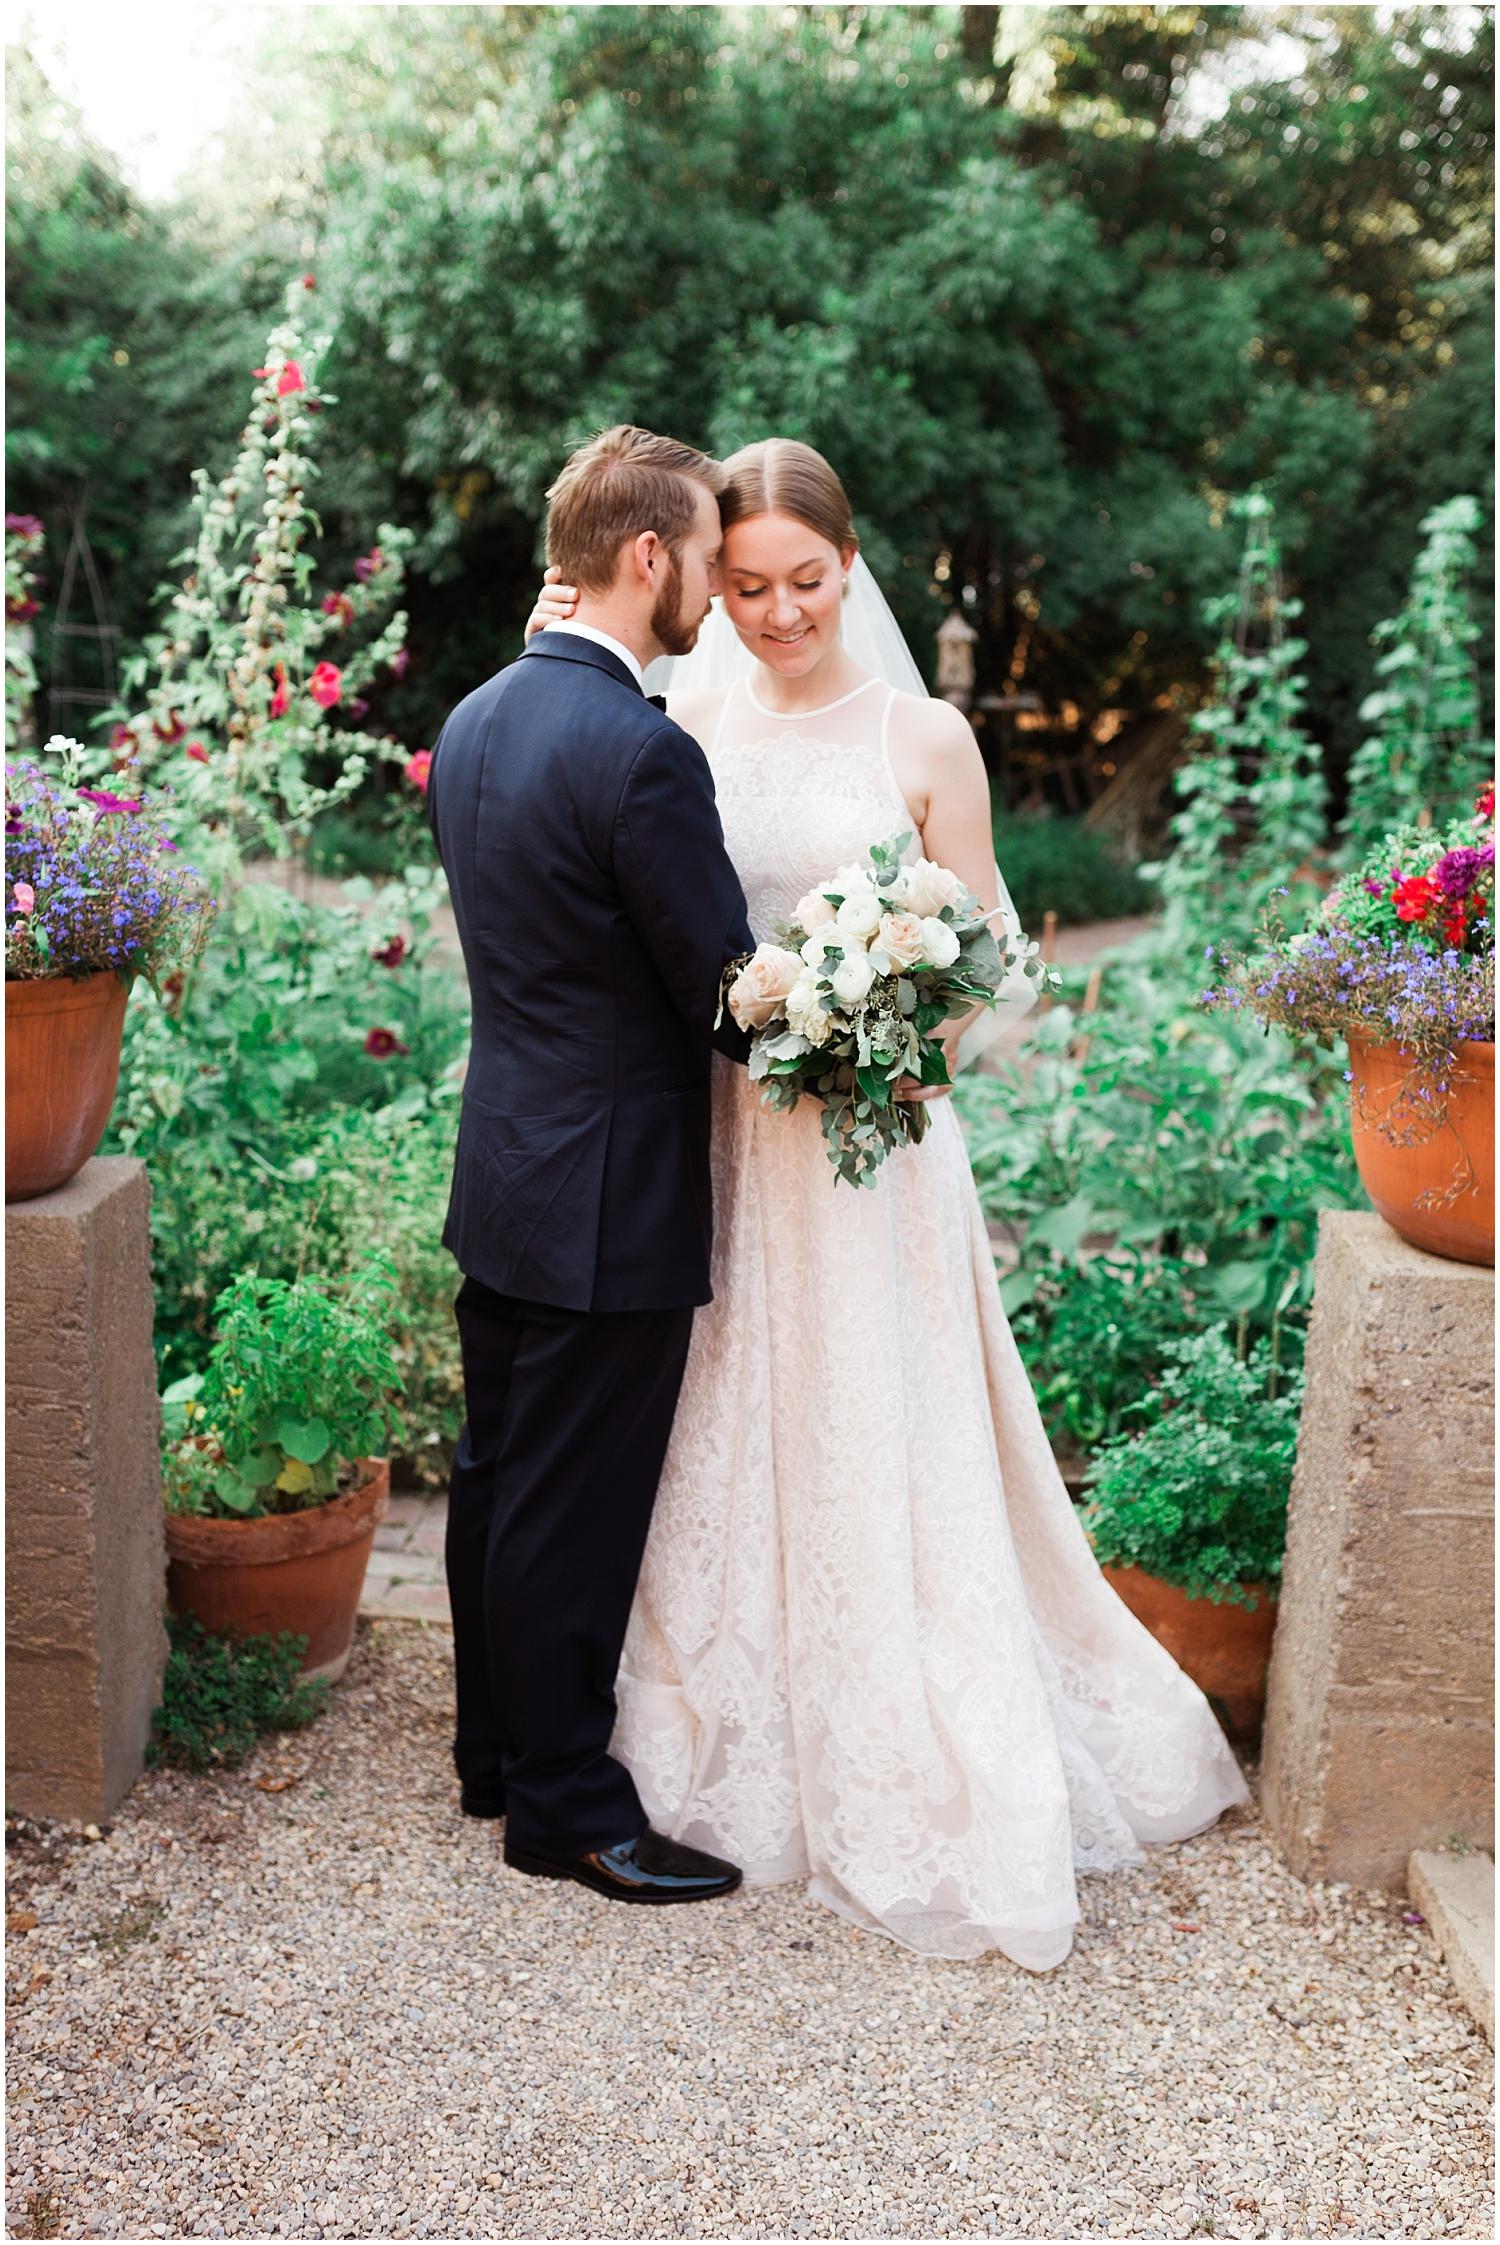 Rachel Reyes Photography-Utah Wedding Photographer-The Villa in Cedar Hills_0063.jpg